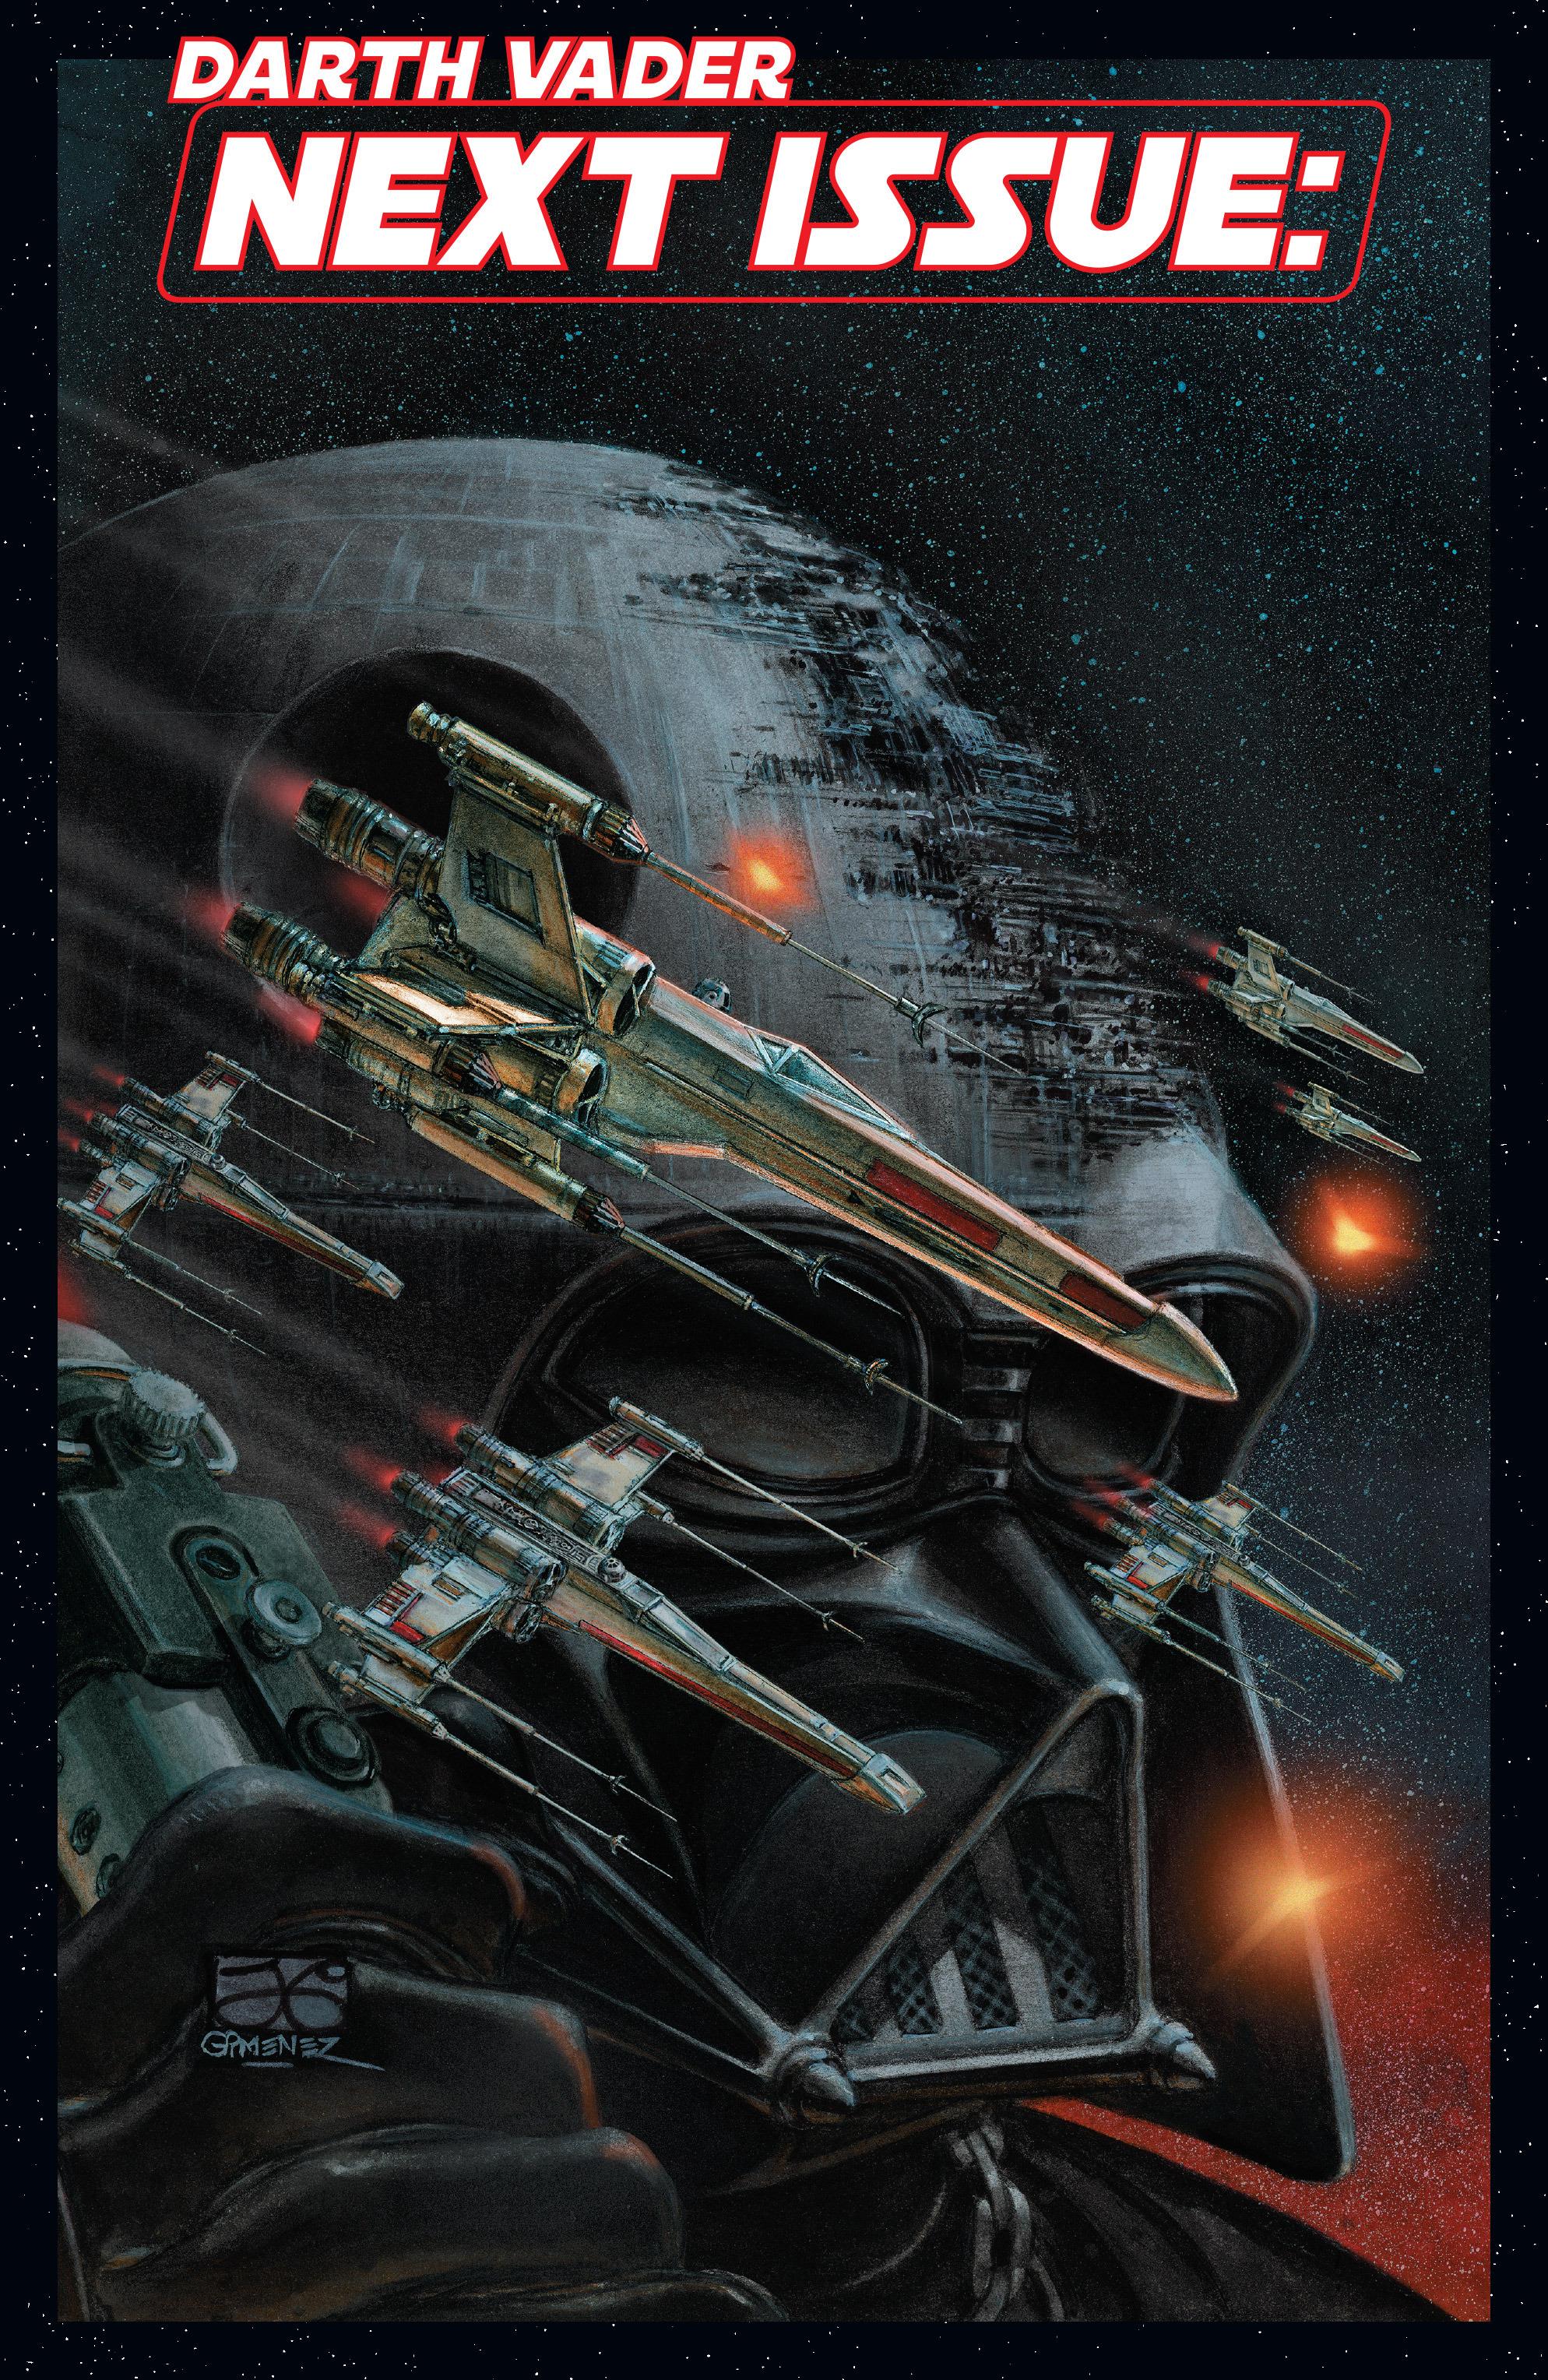 Read online Darth Vader comic -  Issue #24 - 23